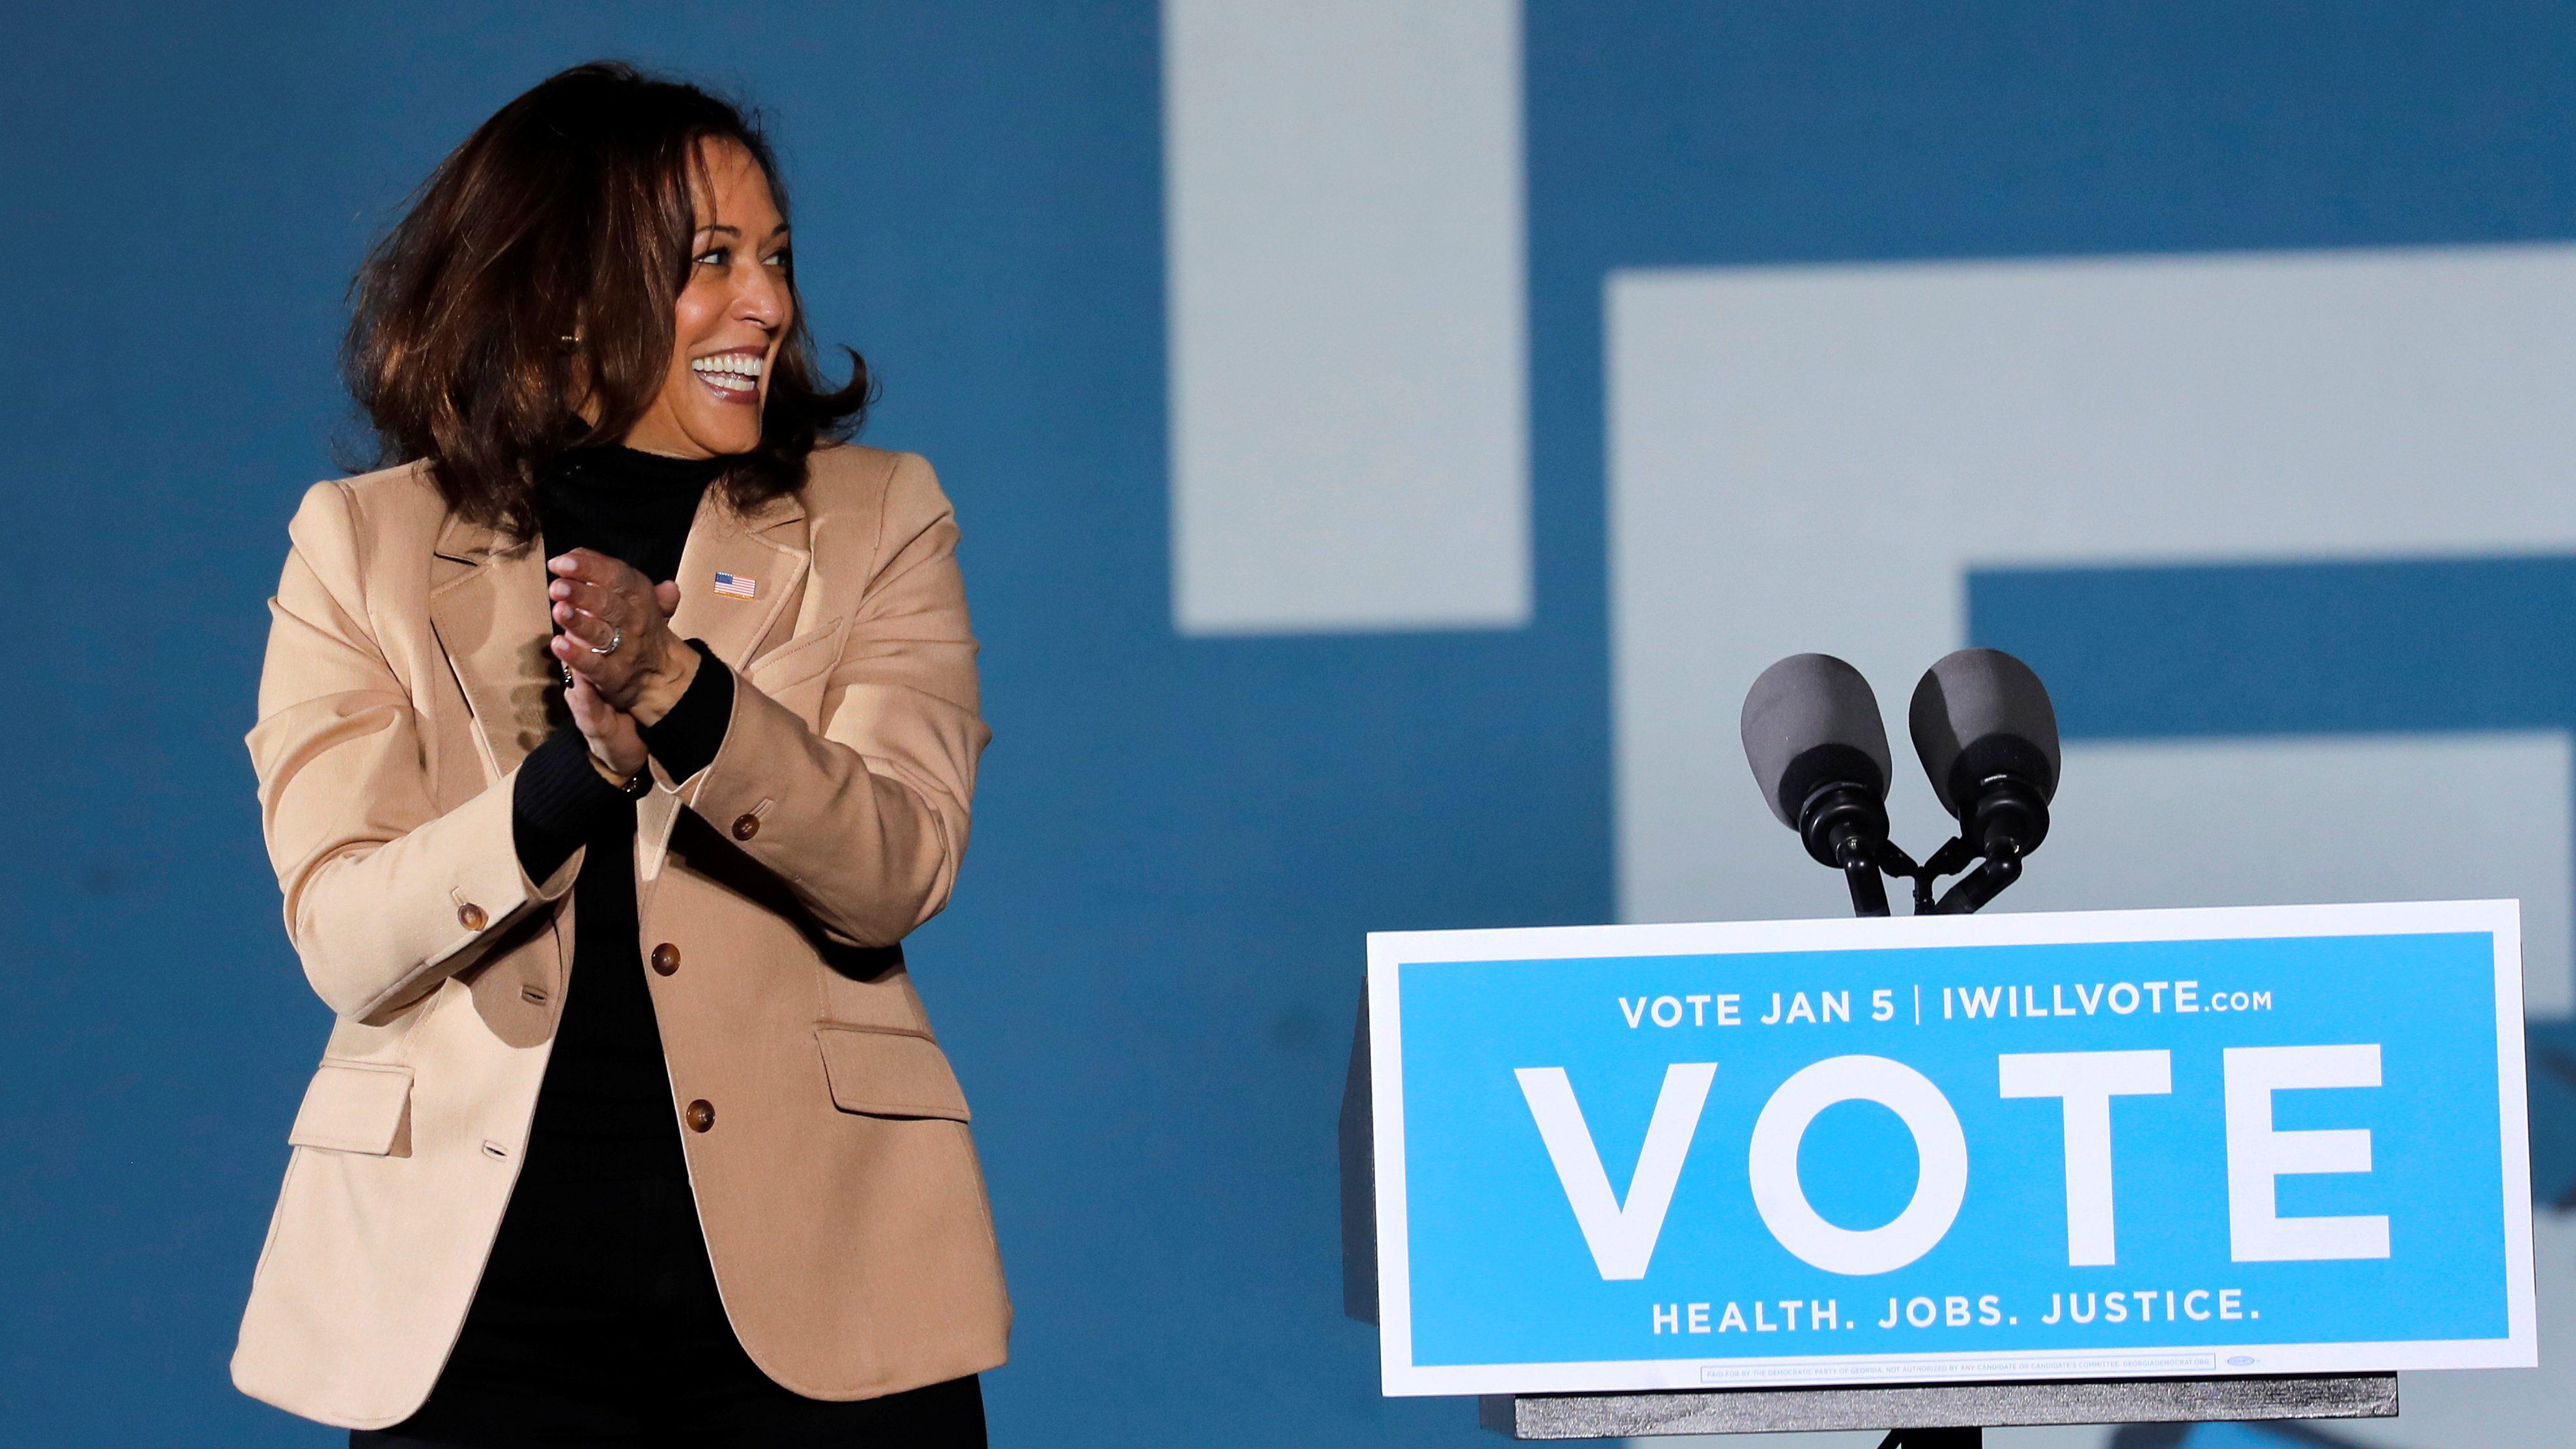 U.S Vice President-elect Kamala Harris campaigns for Democratic U.S. Senate candidates Jon Ossoff and Raphael Warnock at an outdoor campaign event ahead of U.S. Senate runoff elections in Savannah, Georgia